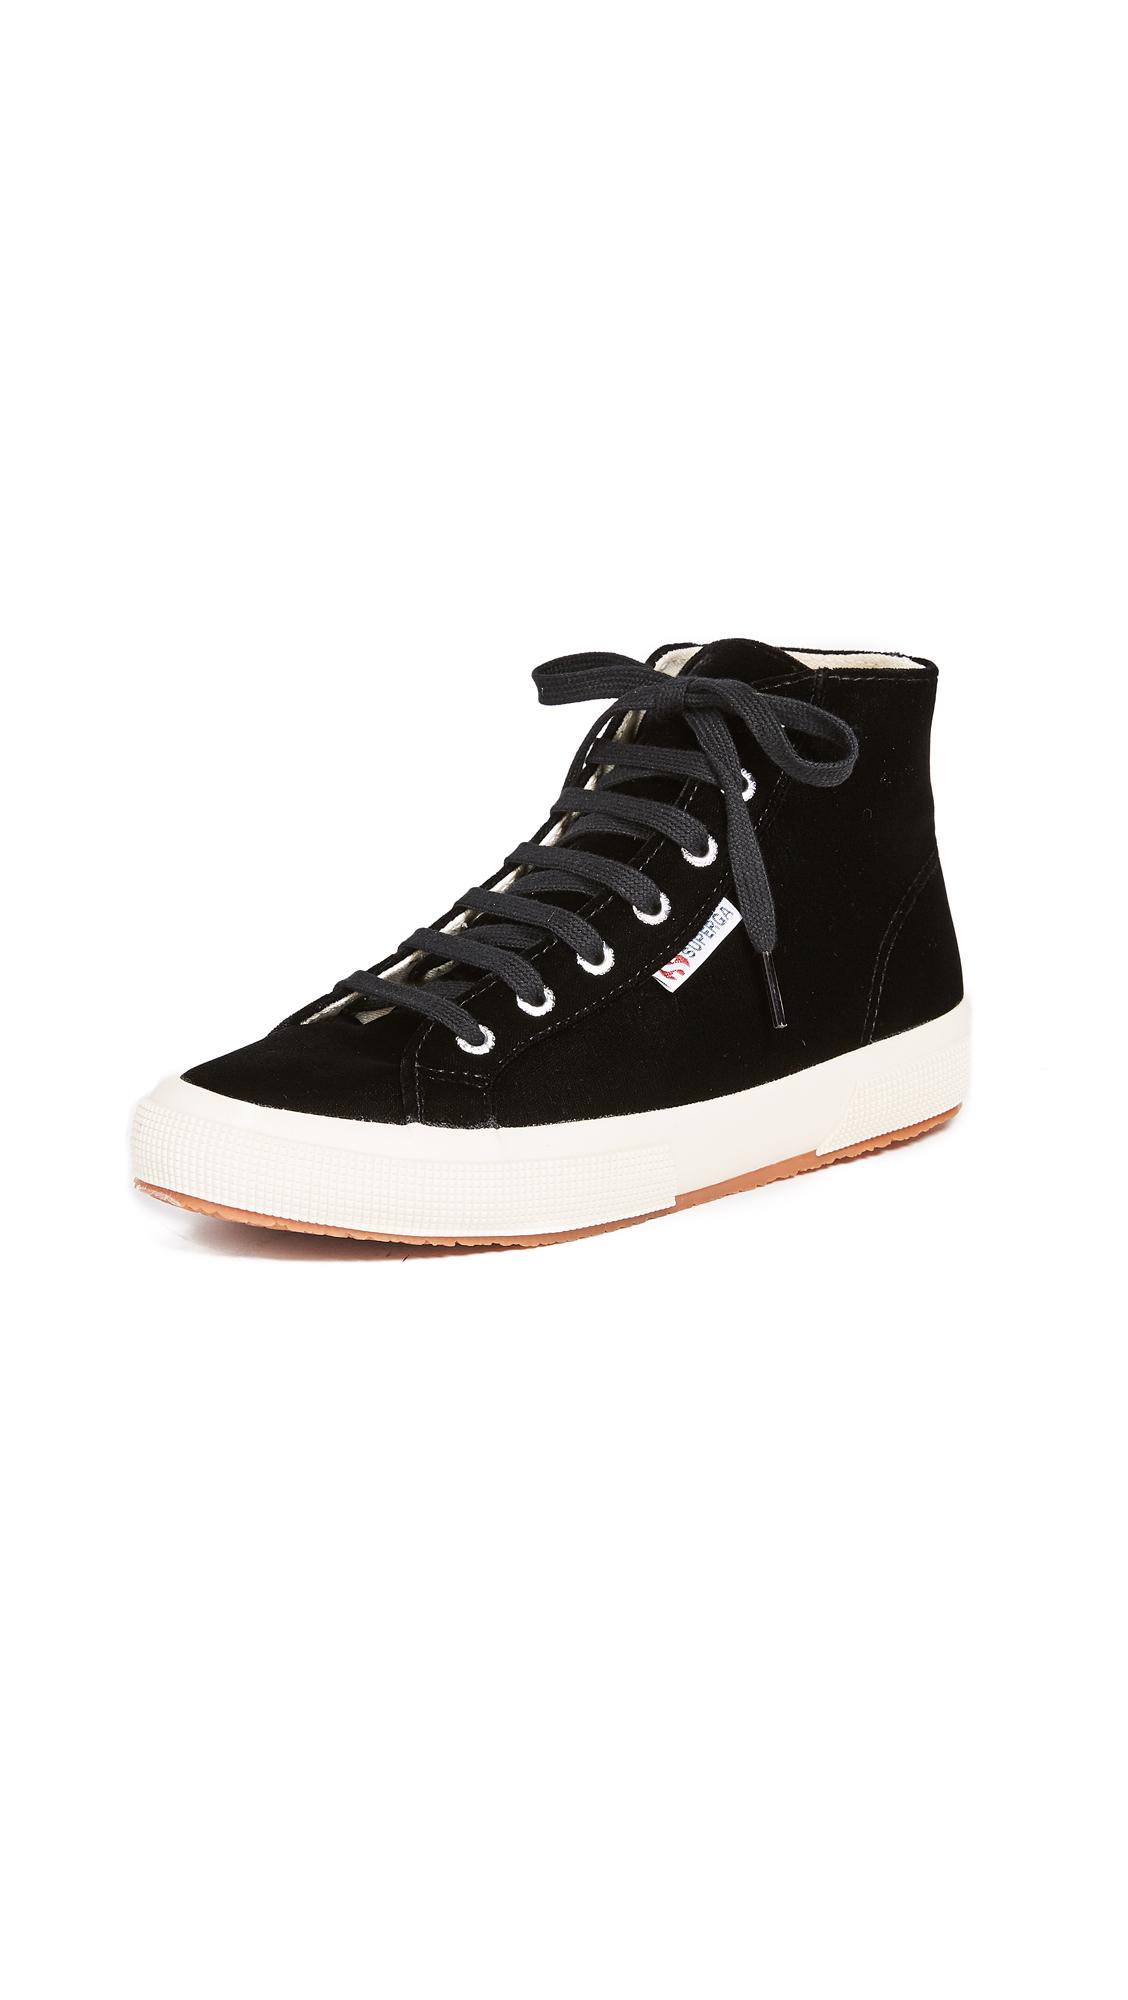 Superga 2795 Velvet High Top Sneakers In Black